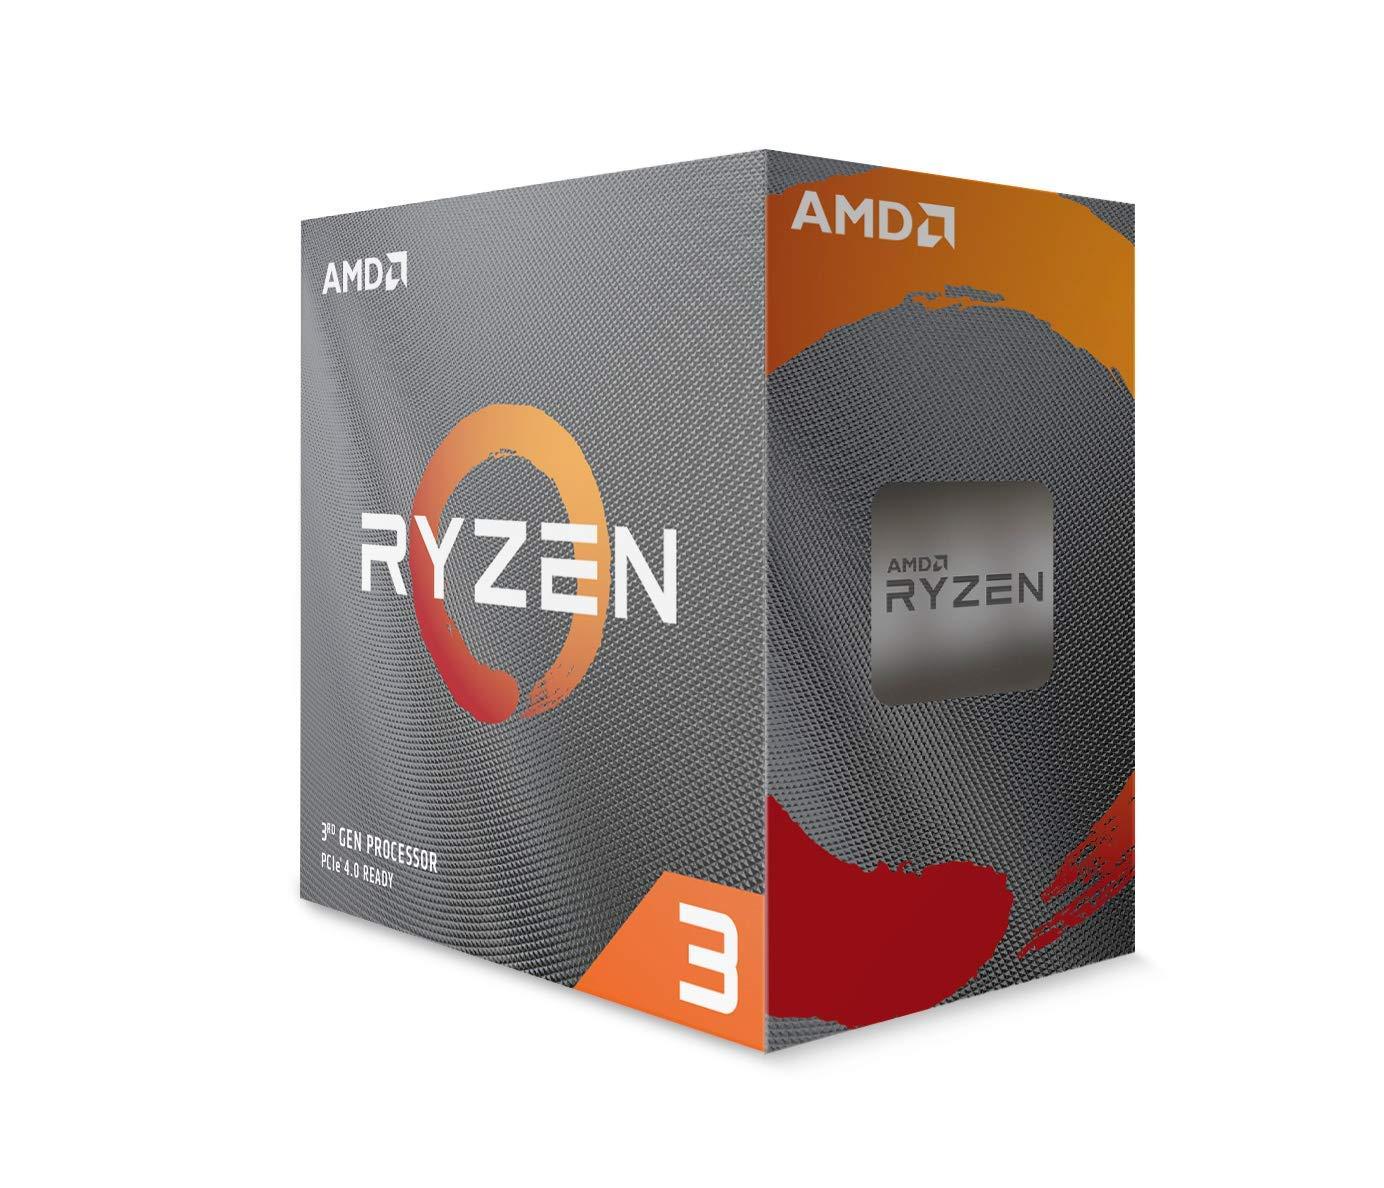 [Best] Gaming PC Build Under ₹50,000 in India [Apr. 2021] 3